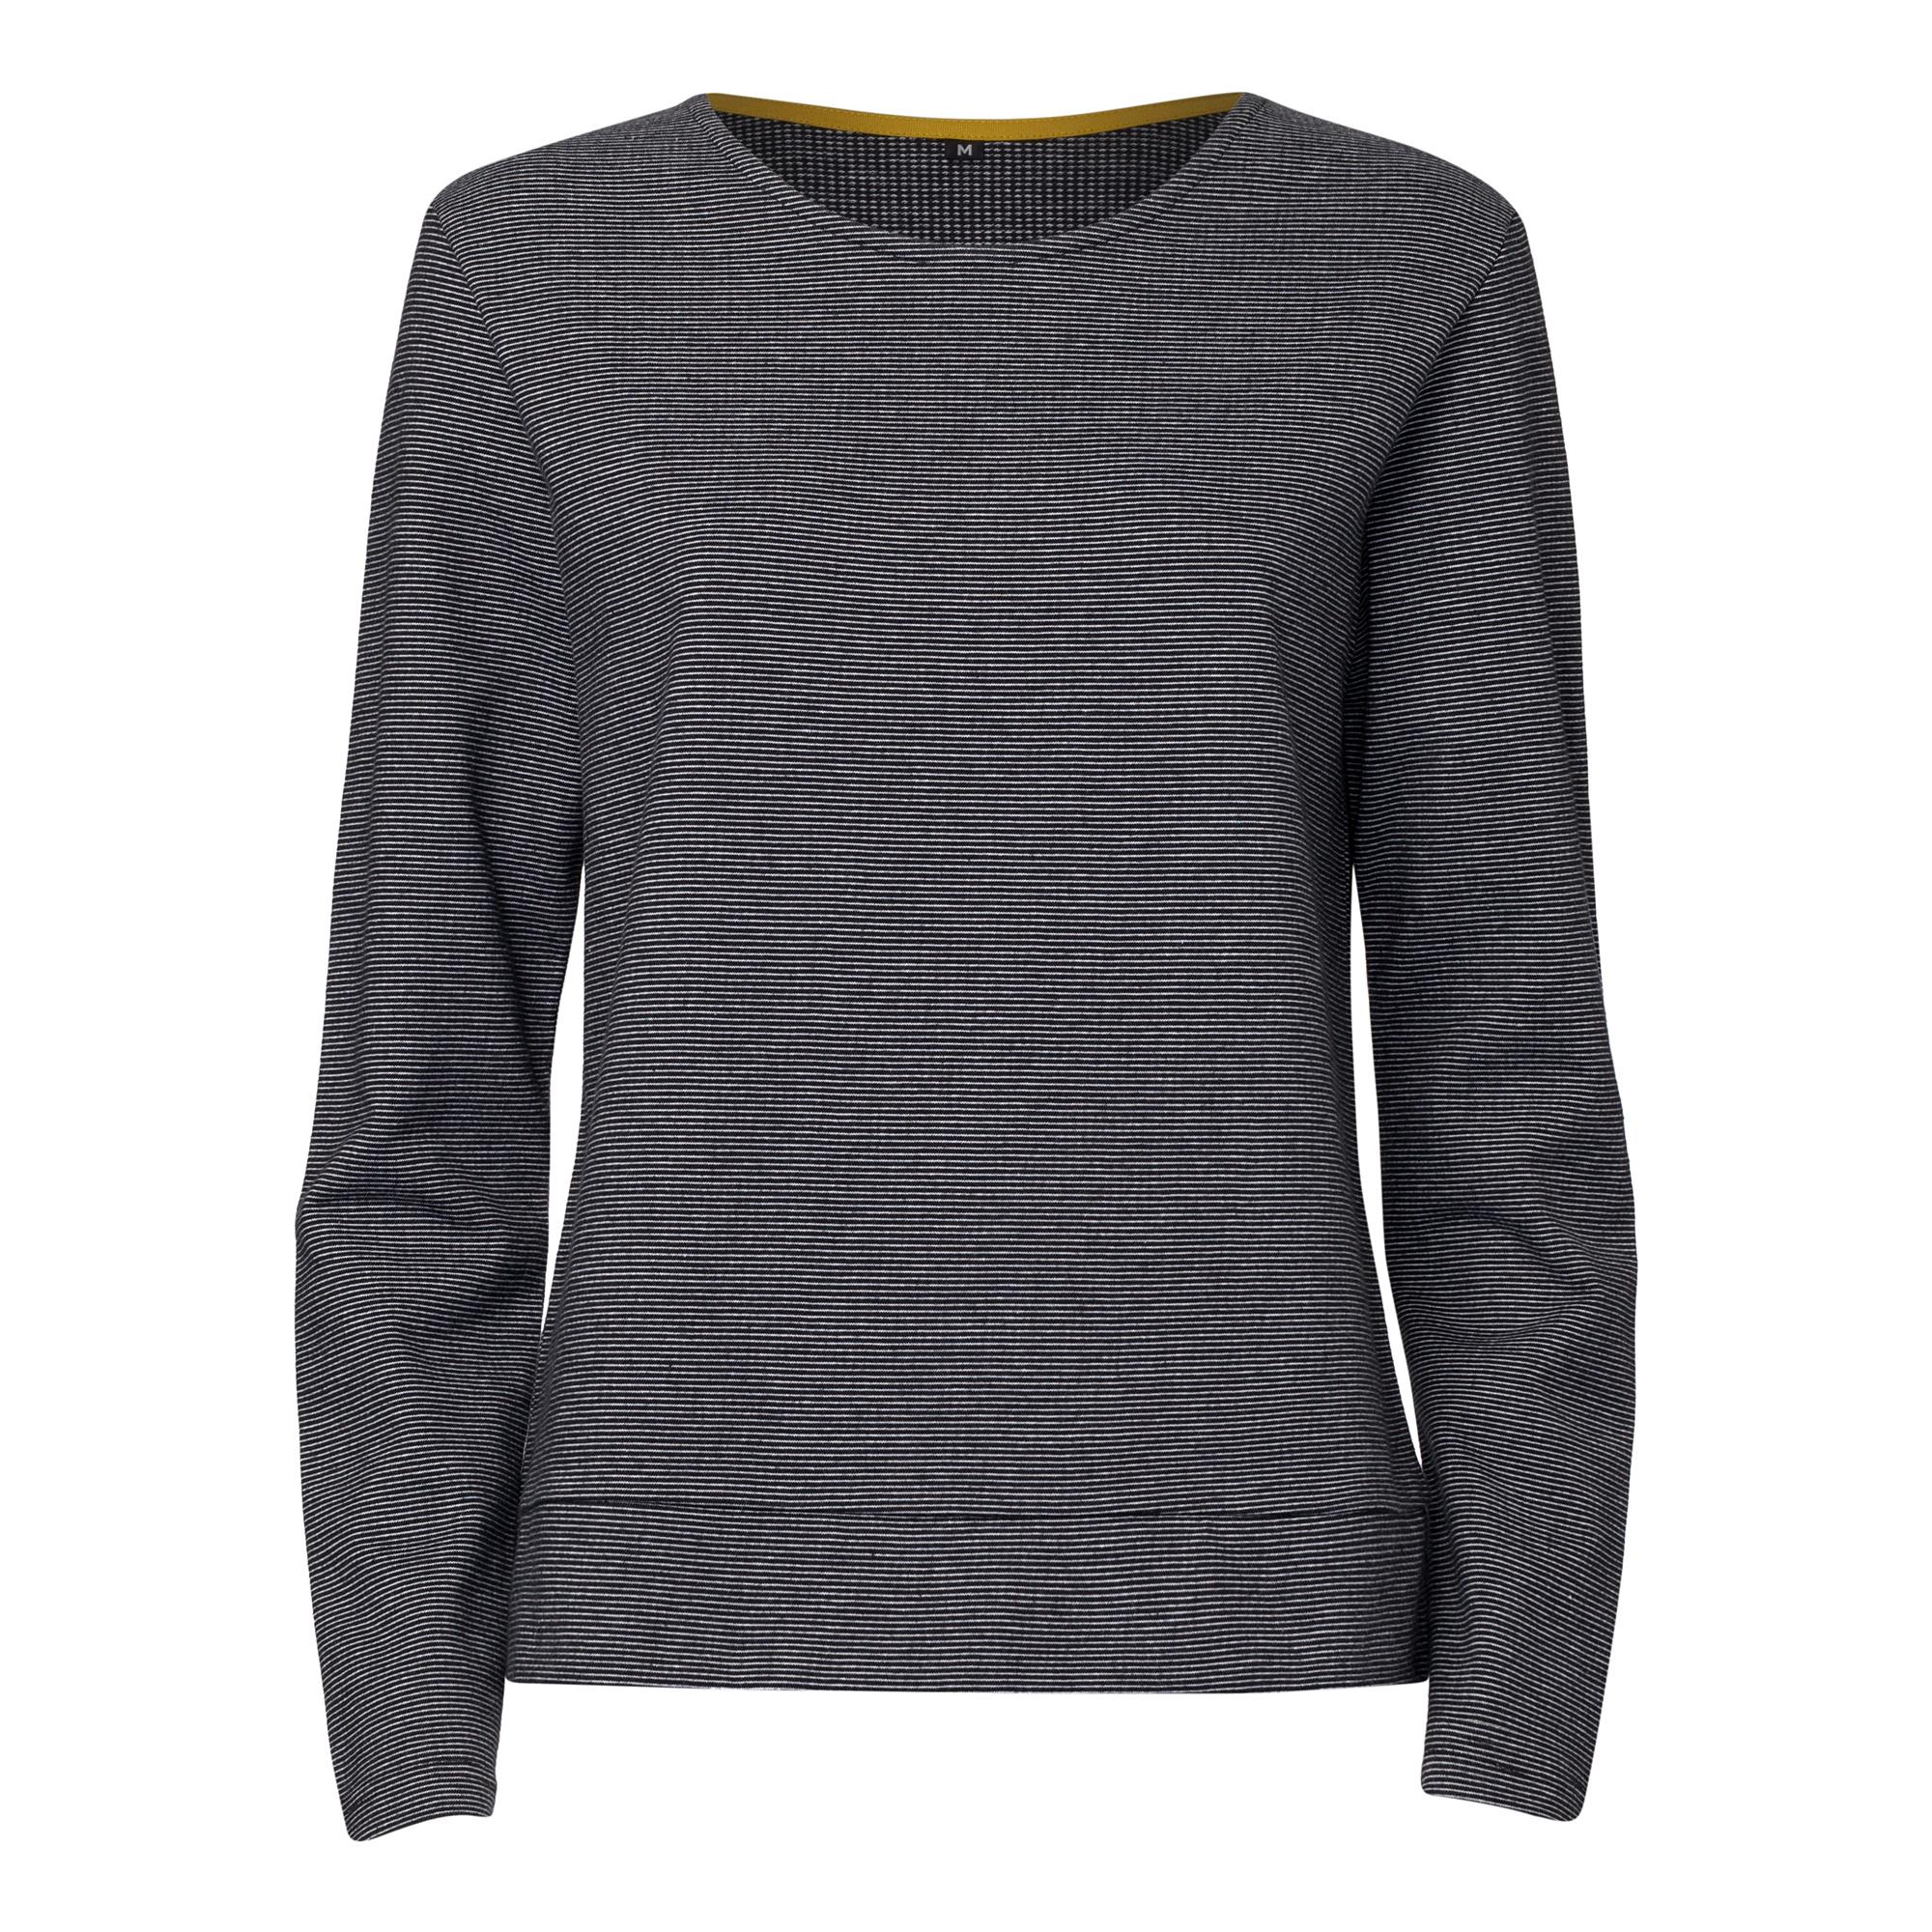 TT1027 Box Sweater Microstripes Woman GOTS & Fairtrade